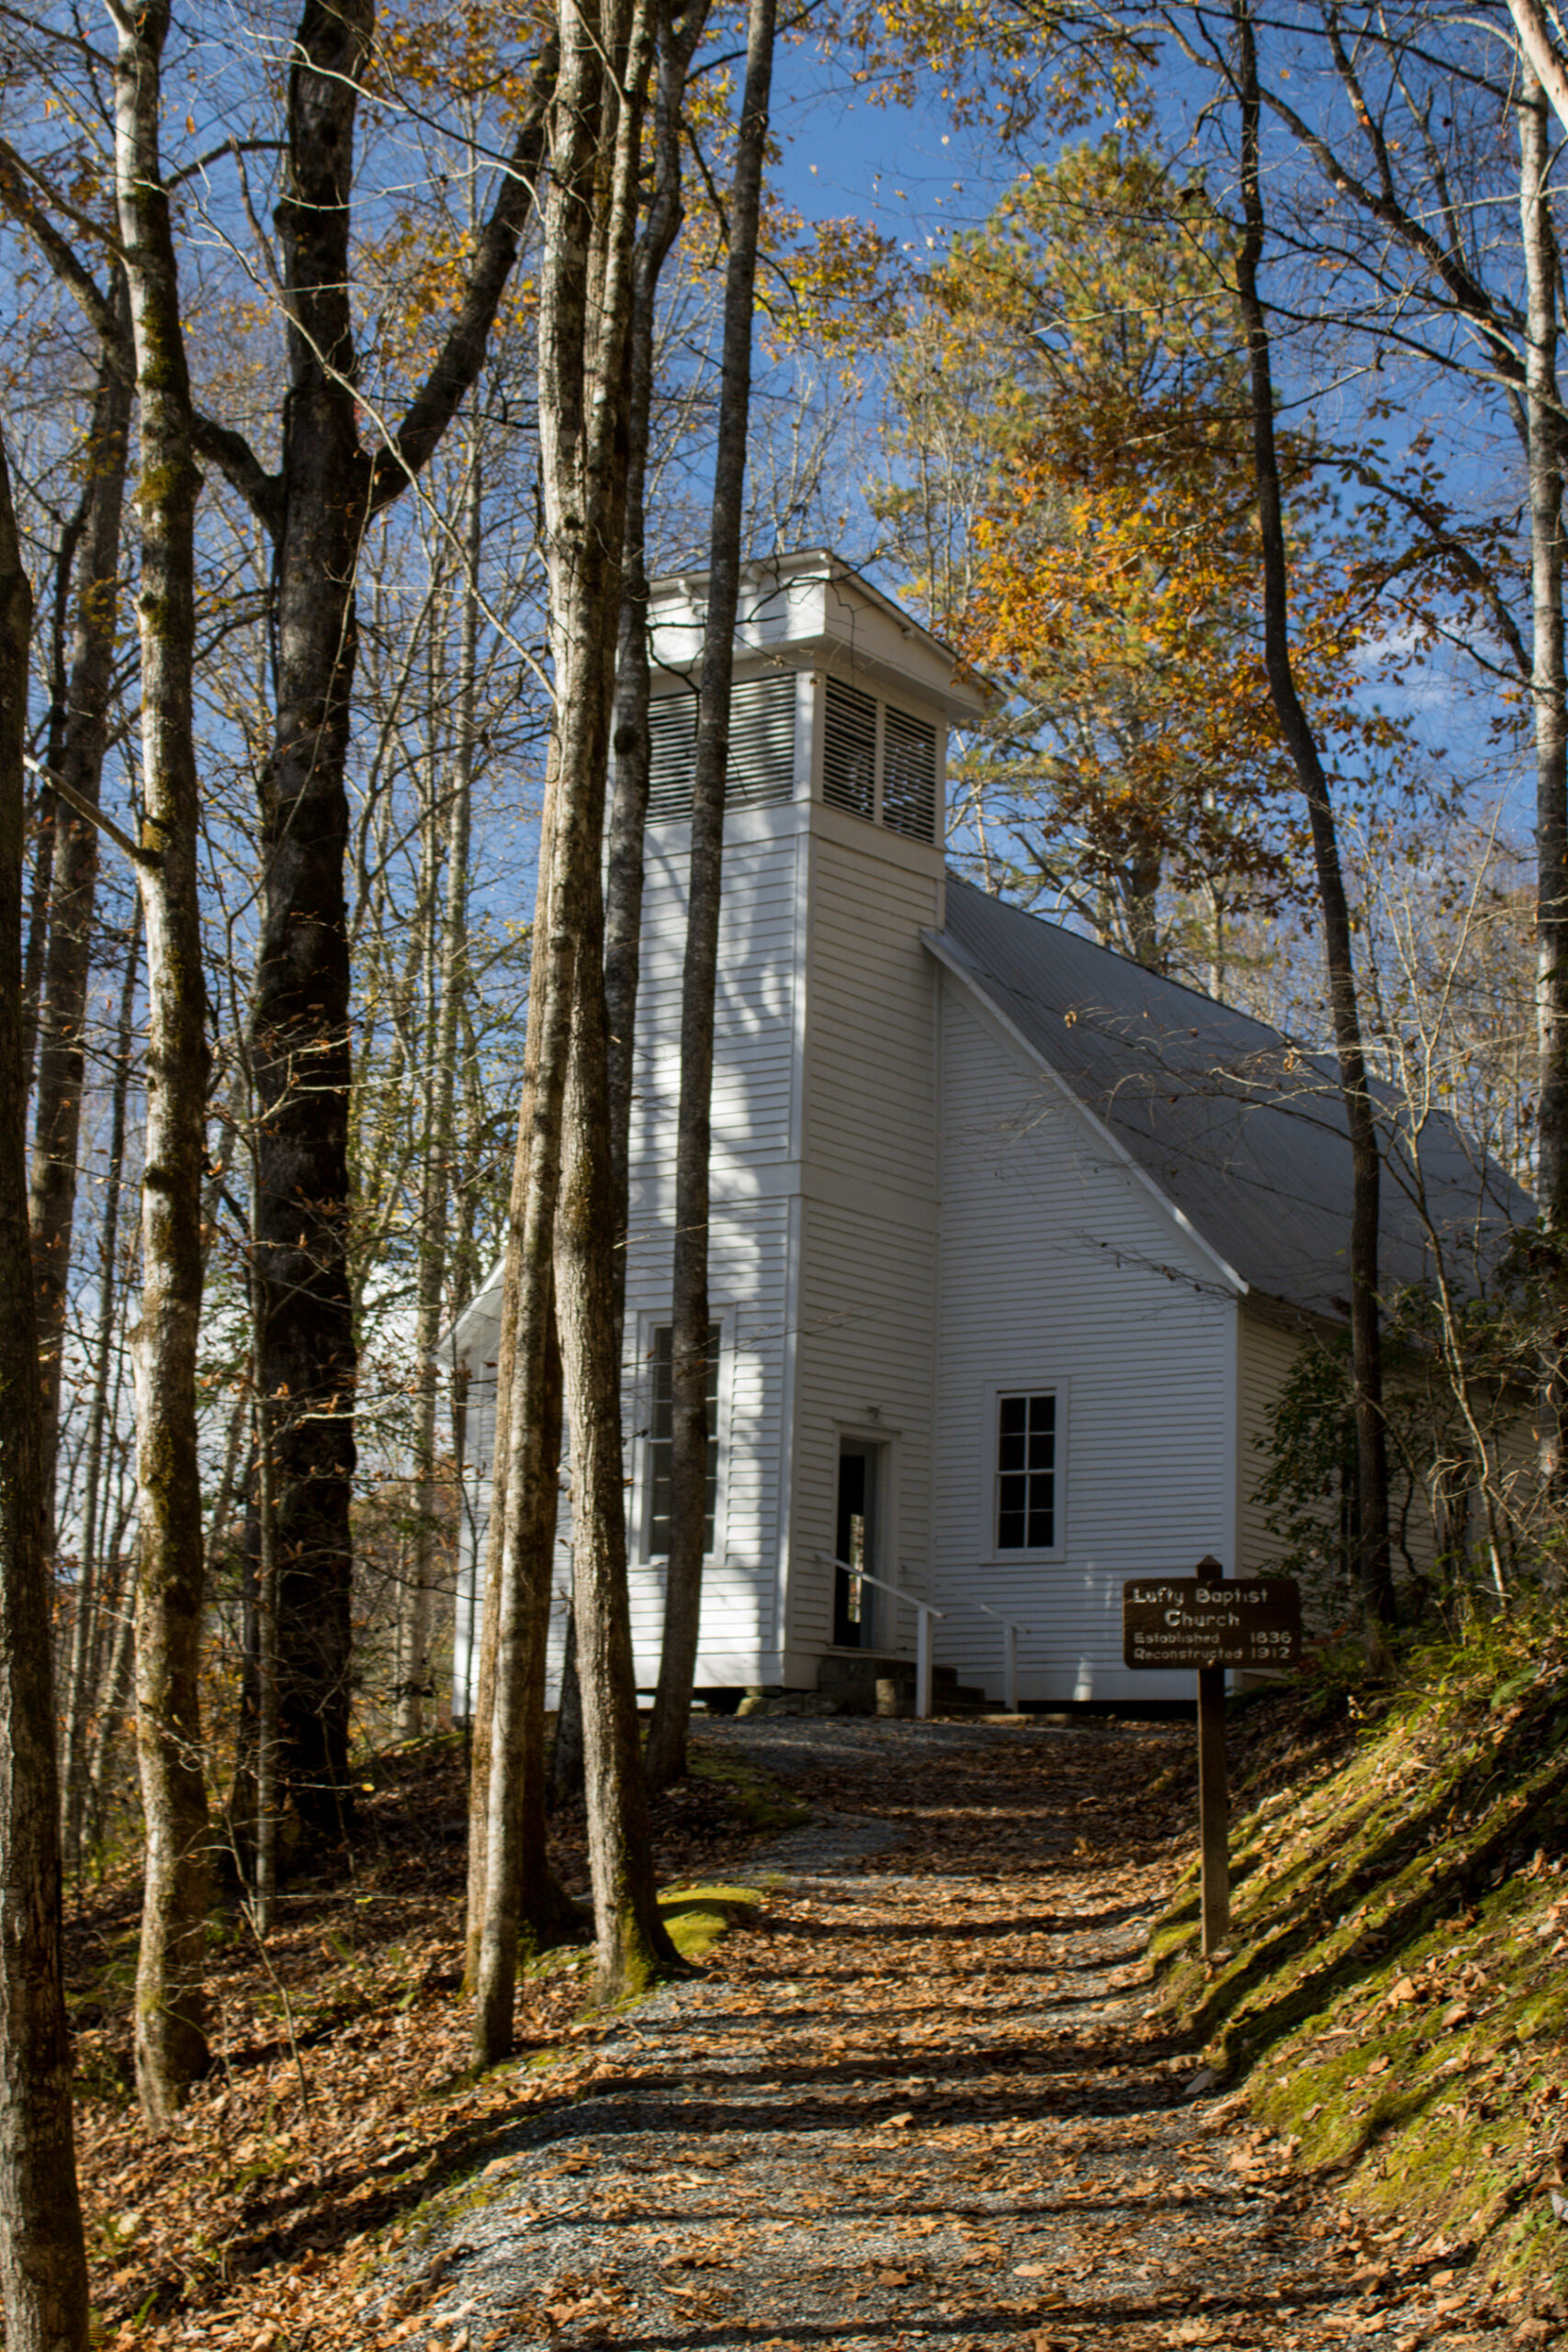 Lufty Baptist Church in Smokemont